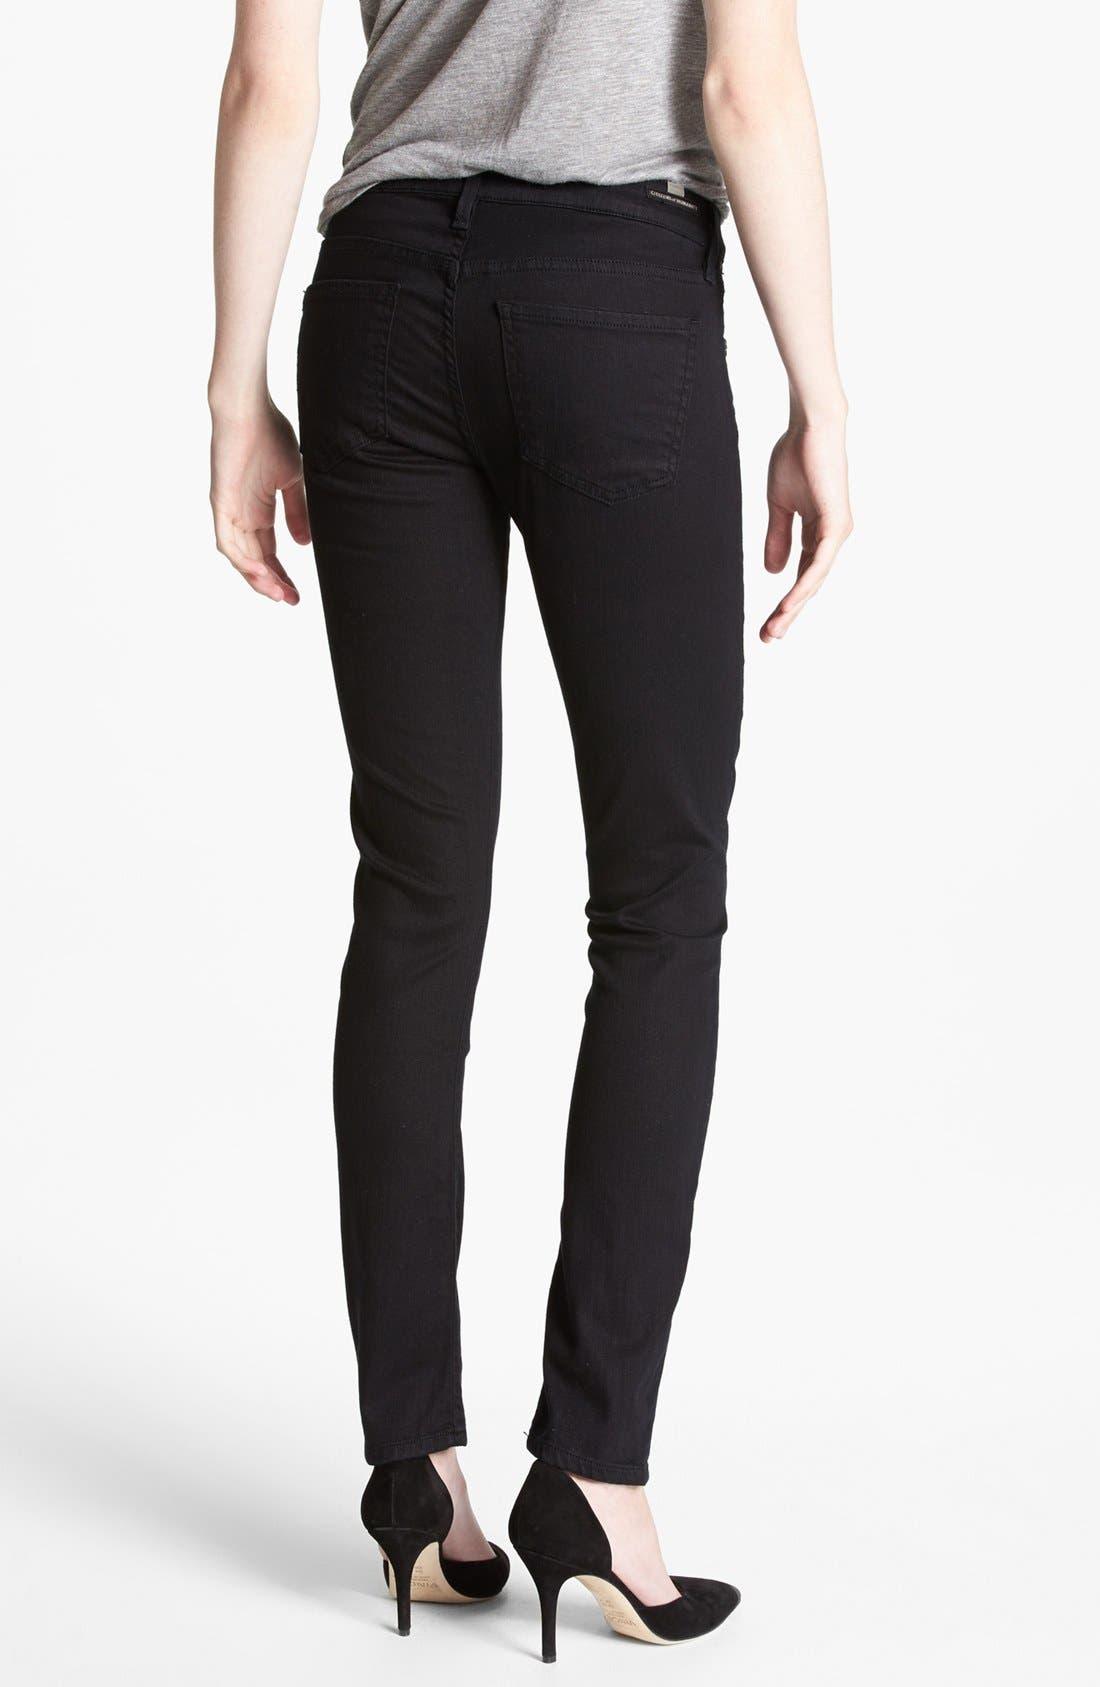 Alternate Image 2  - Citizens of Humanity 'Racer' Low Rise Skinny Jeans (Black Diamond)